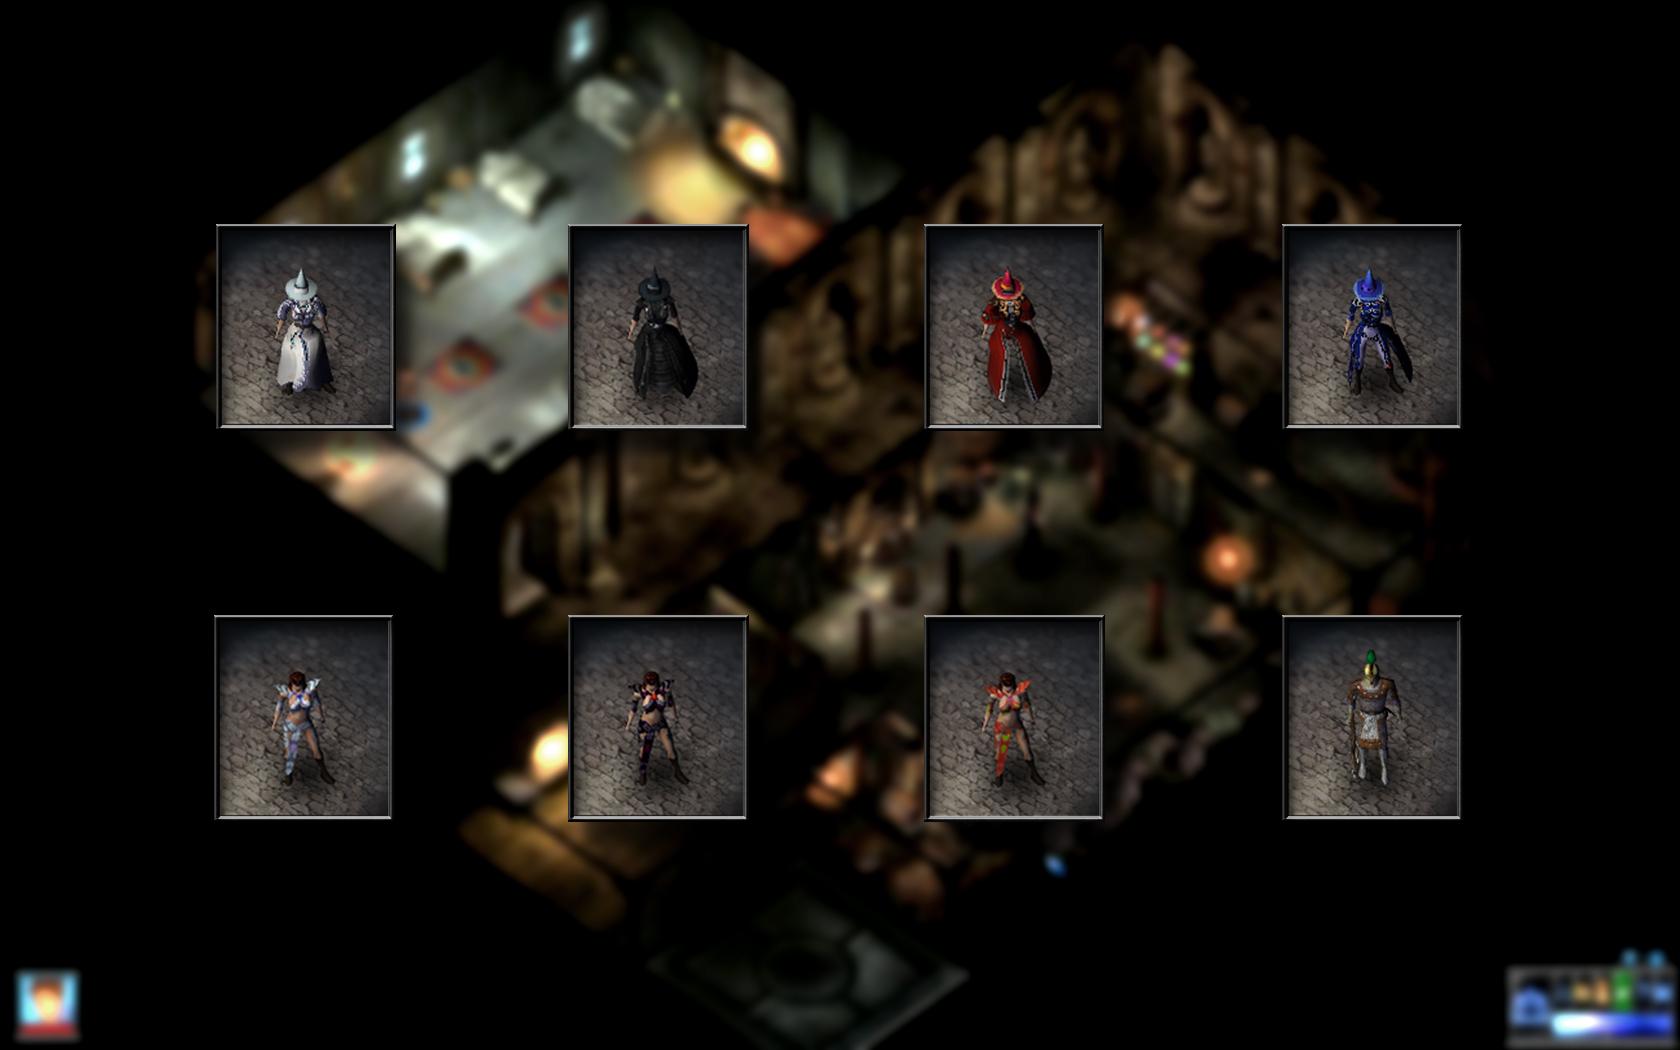 Temple of elemental evil mod nude adult pic